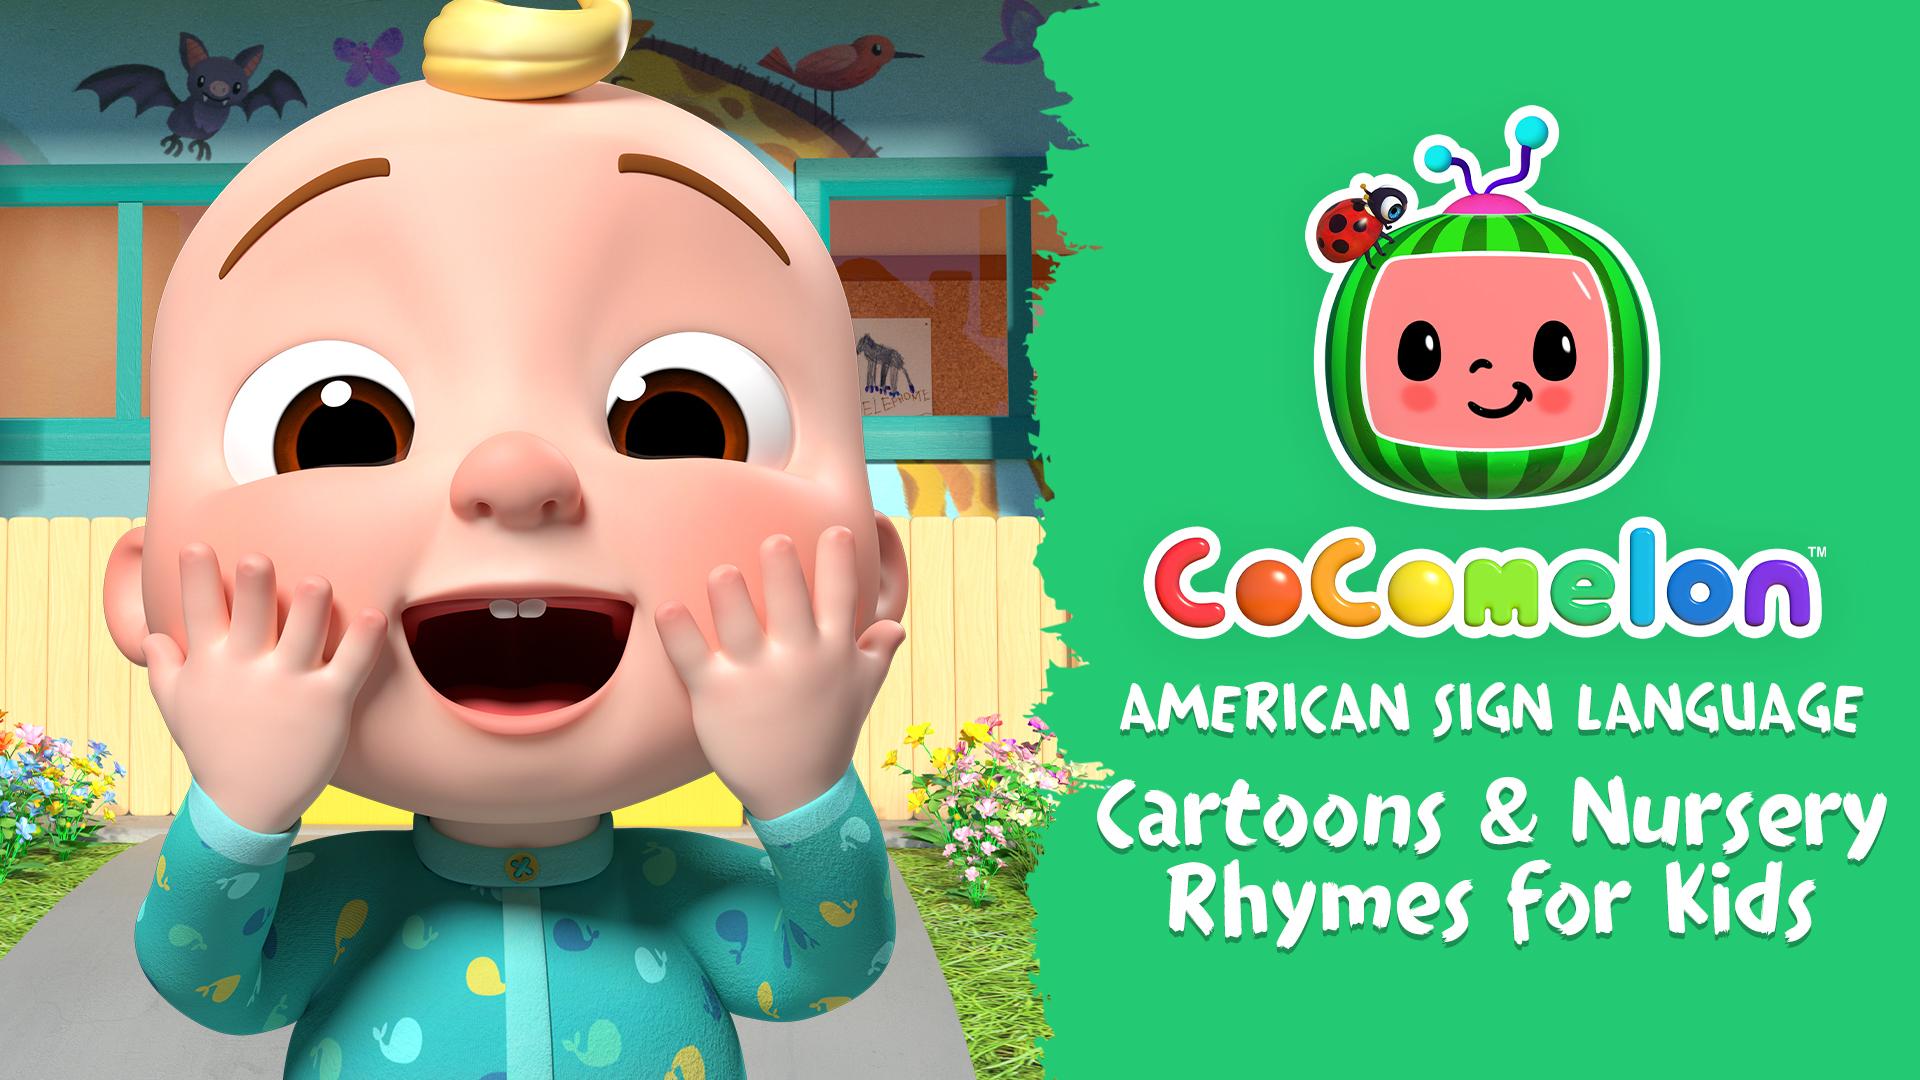 Cocomelon American Sign Language - Cartoons for Kids - Season 3